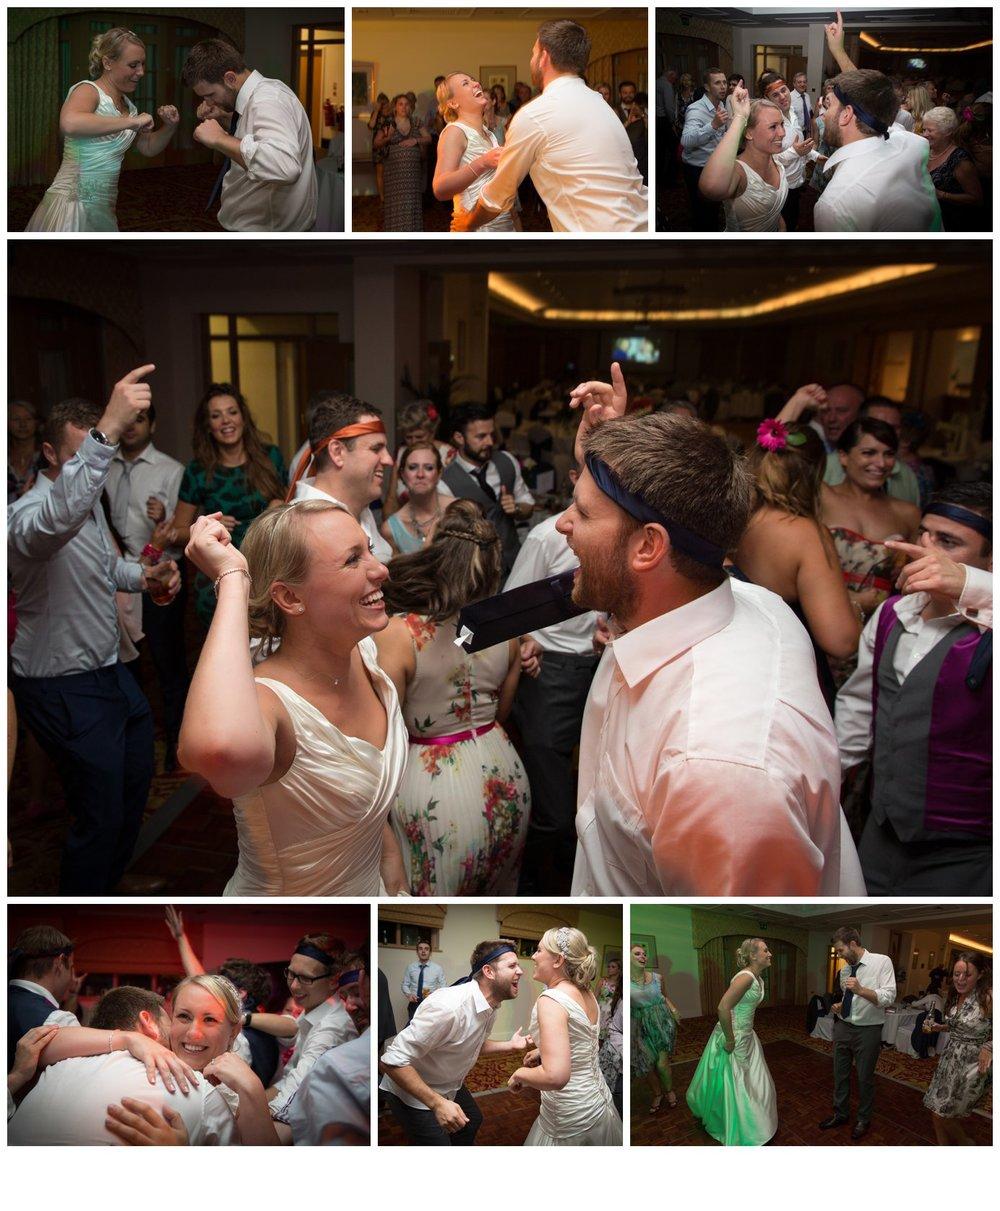 Matt and Rachel having the time of their lives on the dance floor.